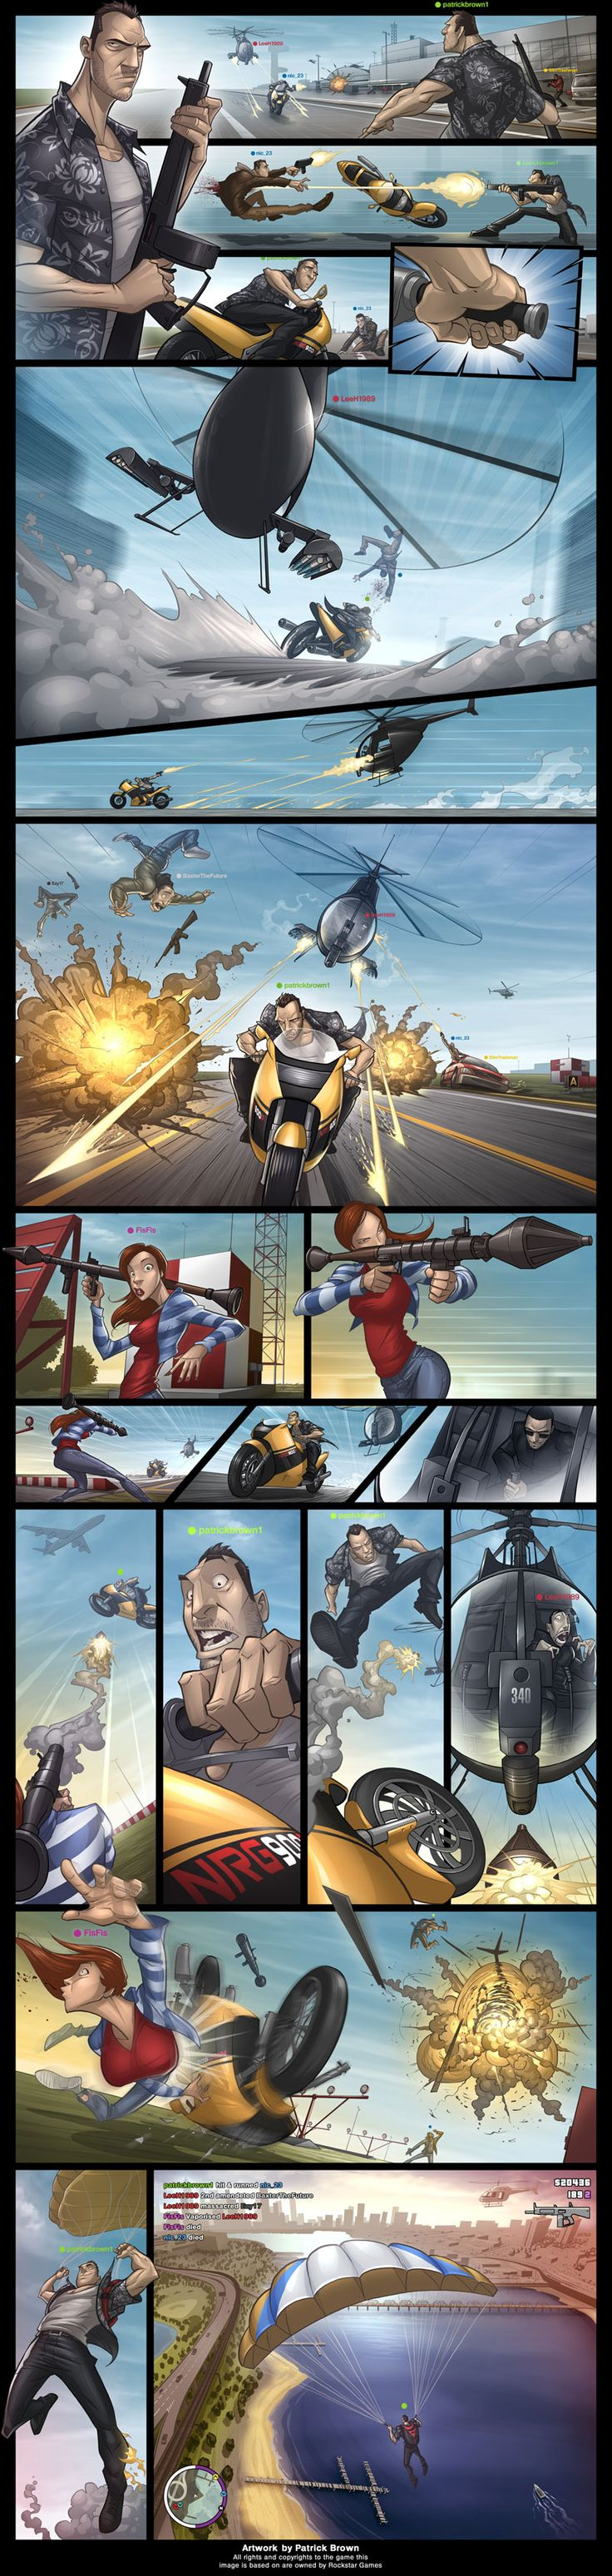 Amazing Grand Theft Auto Videogame Fan Art by Patrick Brown   Abduzeedo Design Inspiration